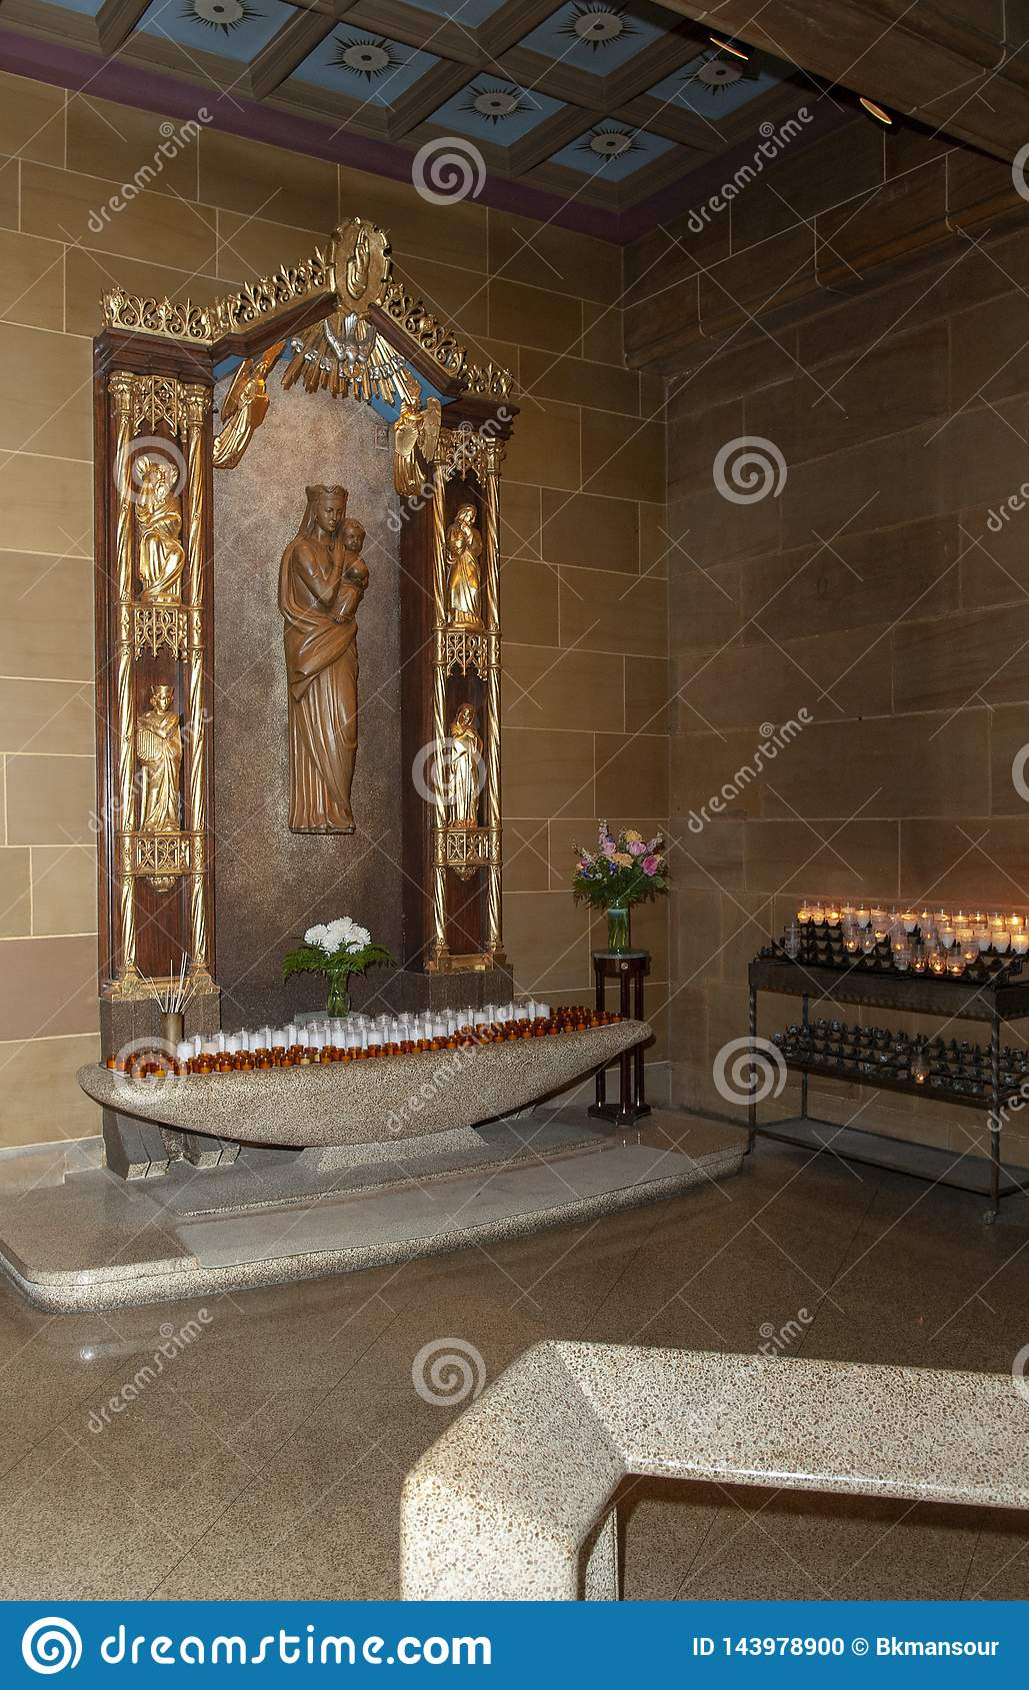 The Inside of a Catholic Church beautiful prayer alter.